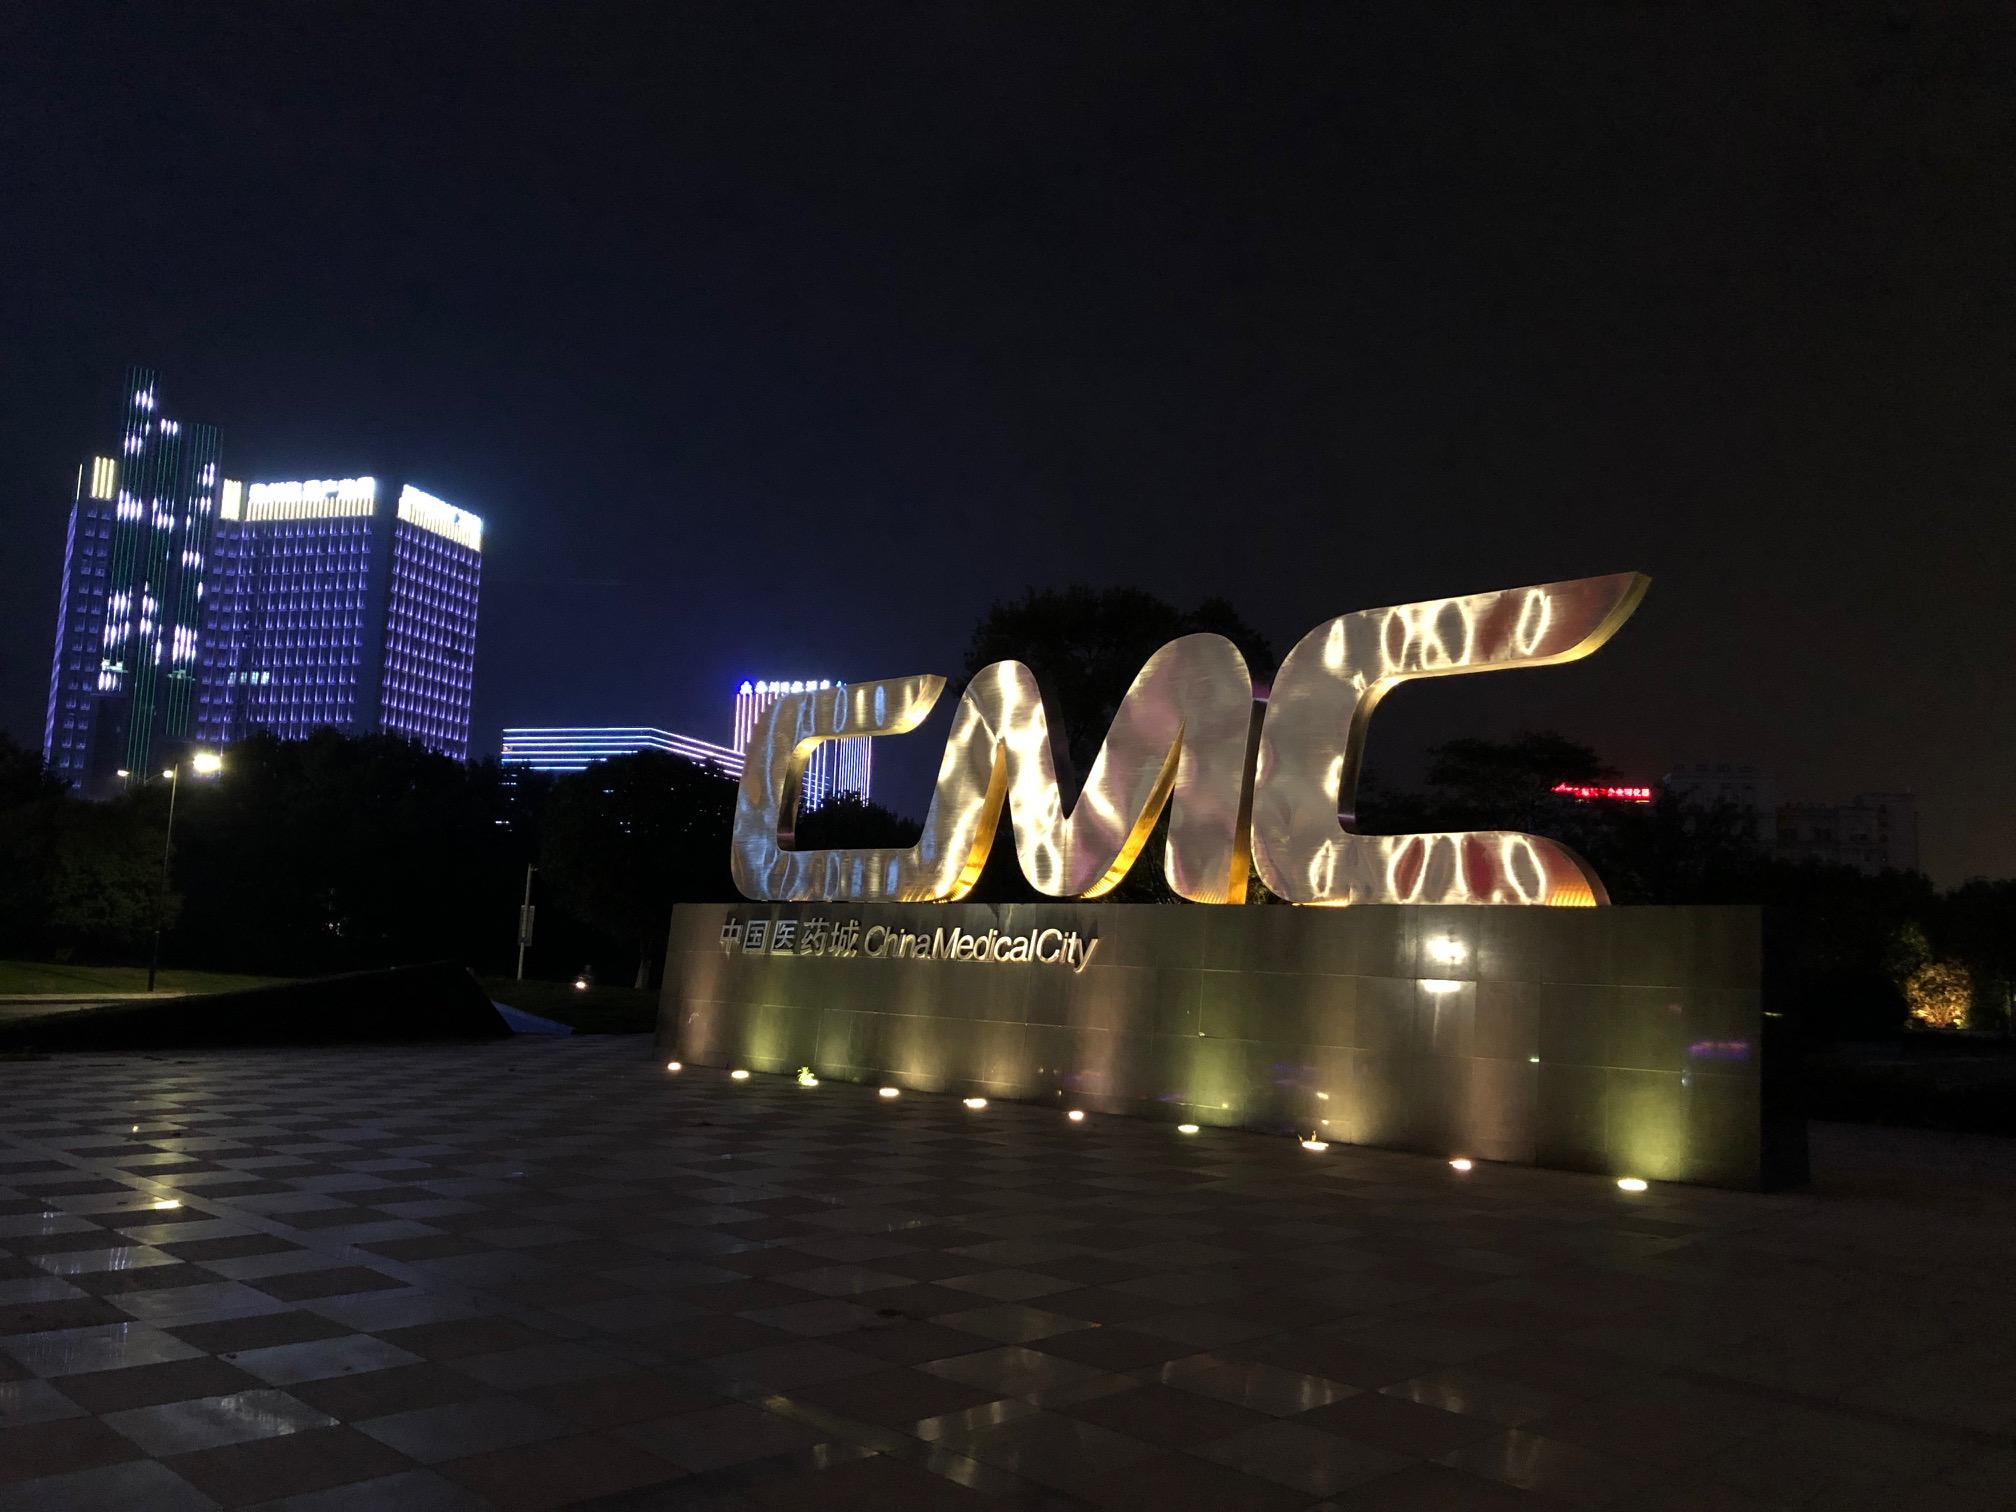 CMC_2bm